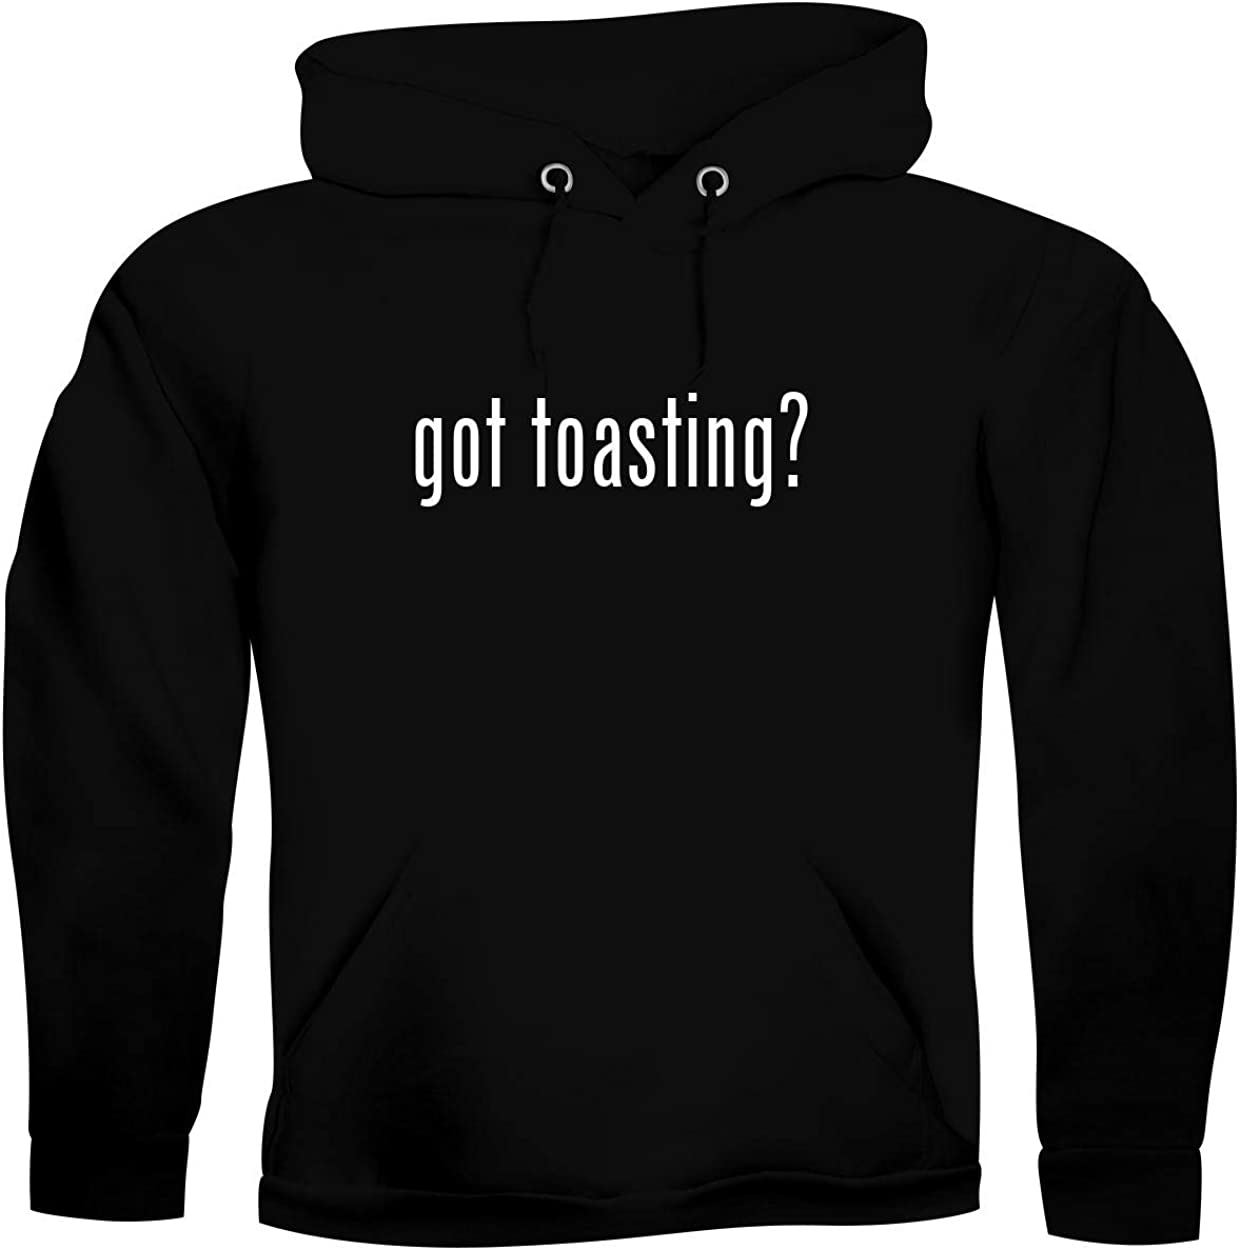 got toasting? - Men's Ultra Soft Hoodie Sweatshirt